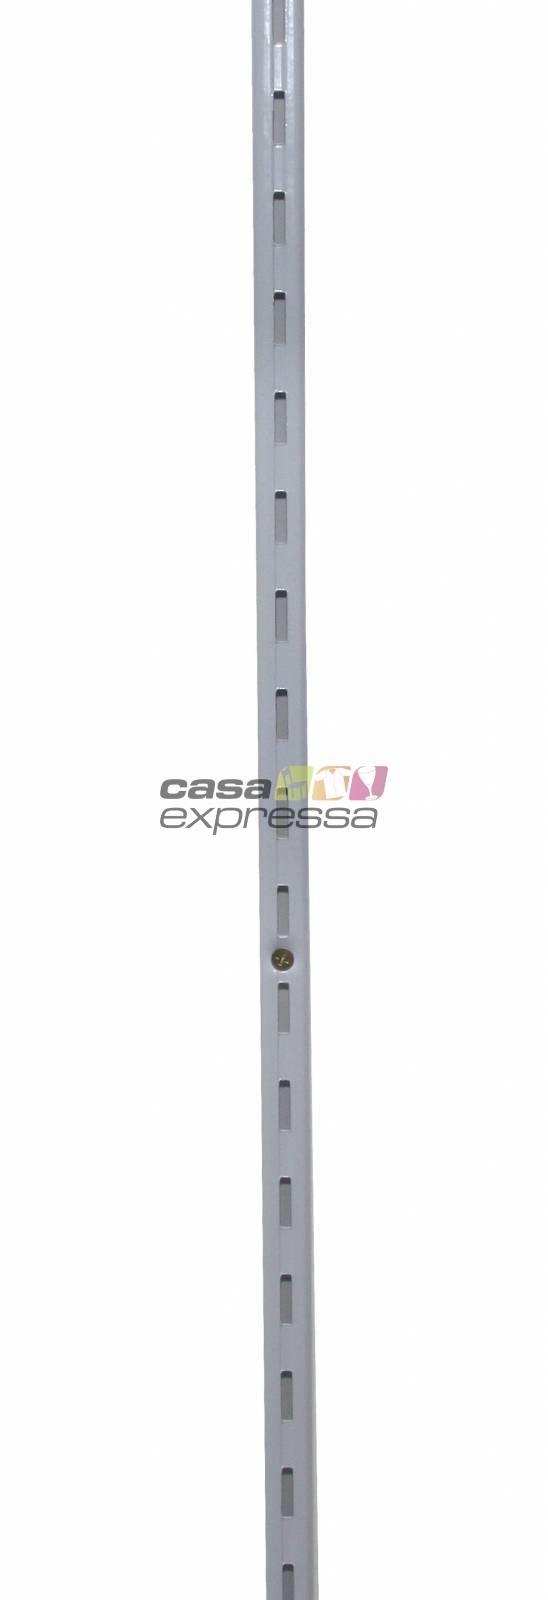 Arara Closet Kit - ZK02C - 90x100cm - CASA EXPRESSA